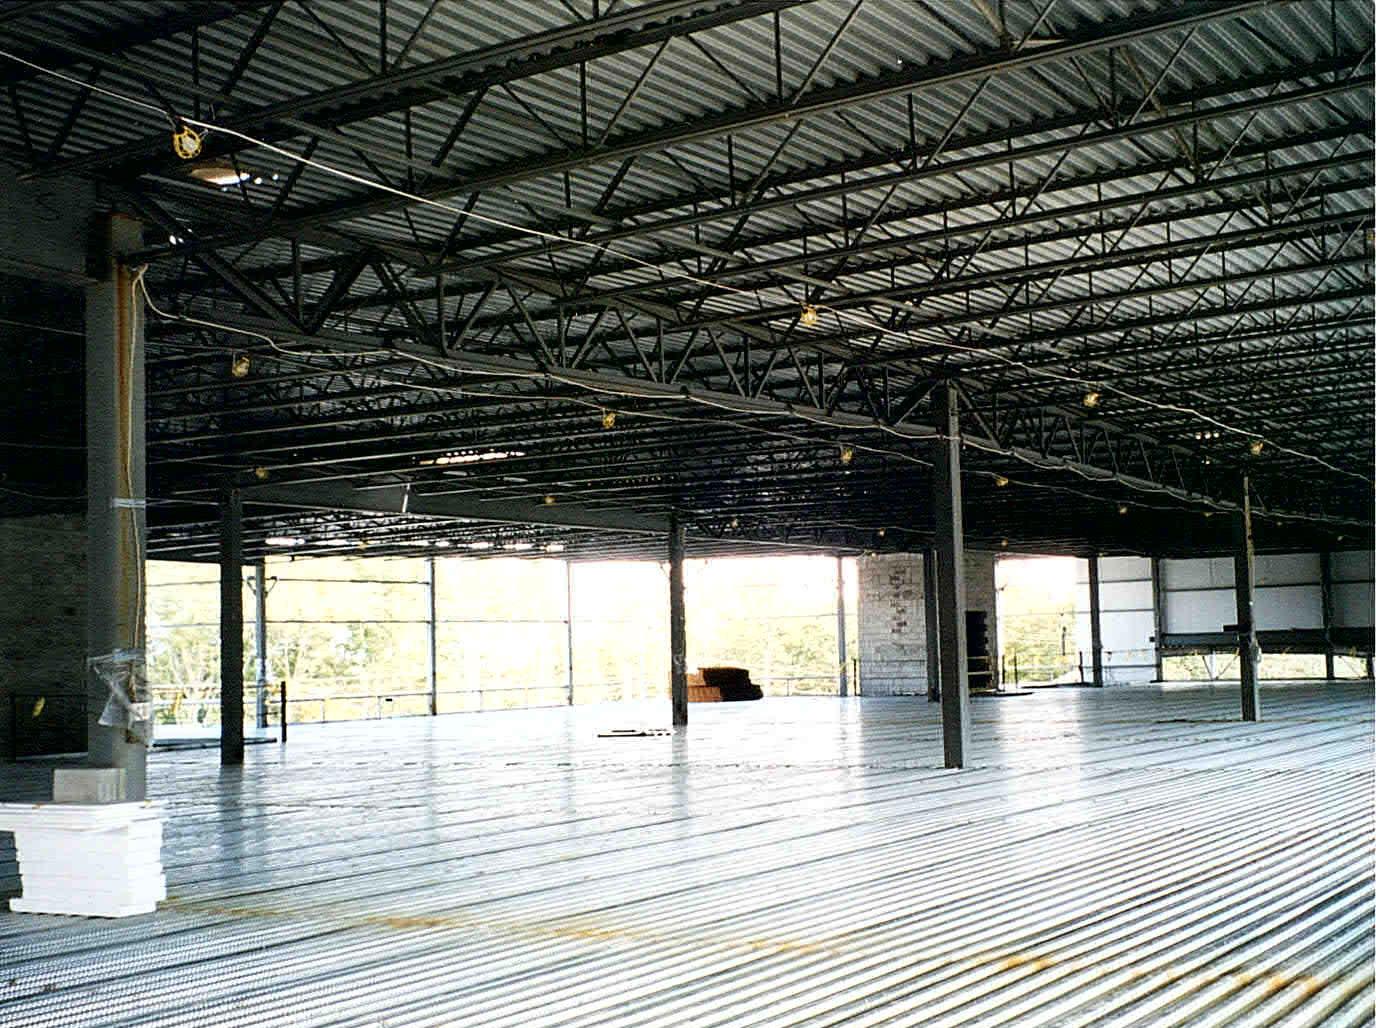 Boudreaus structural steel erectors